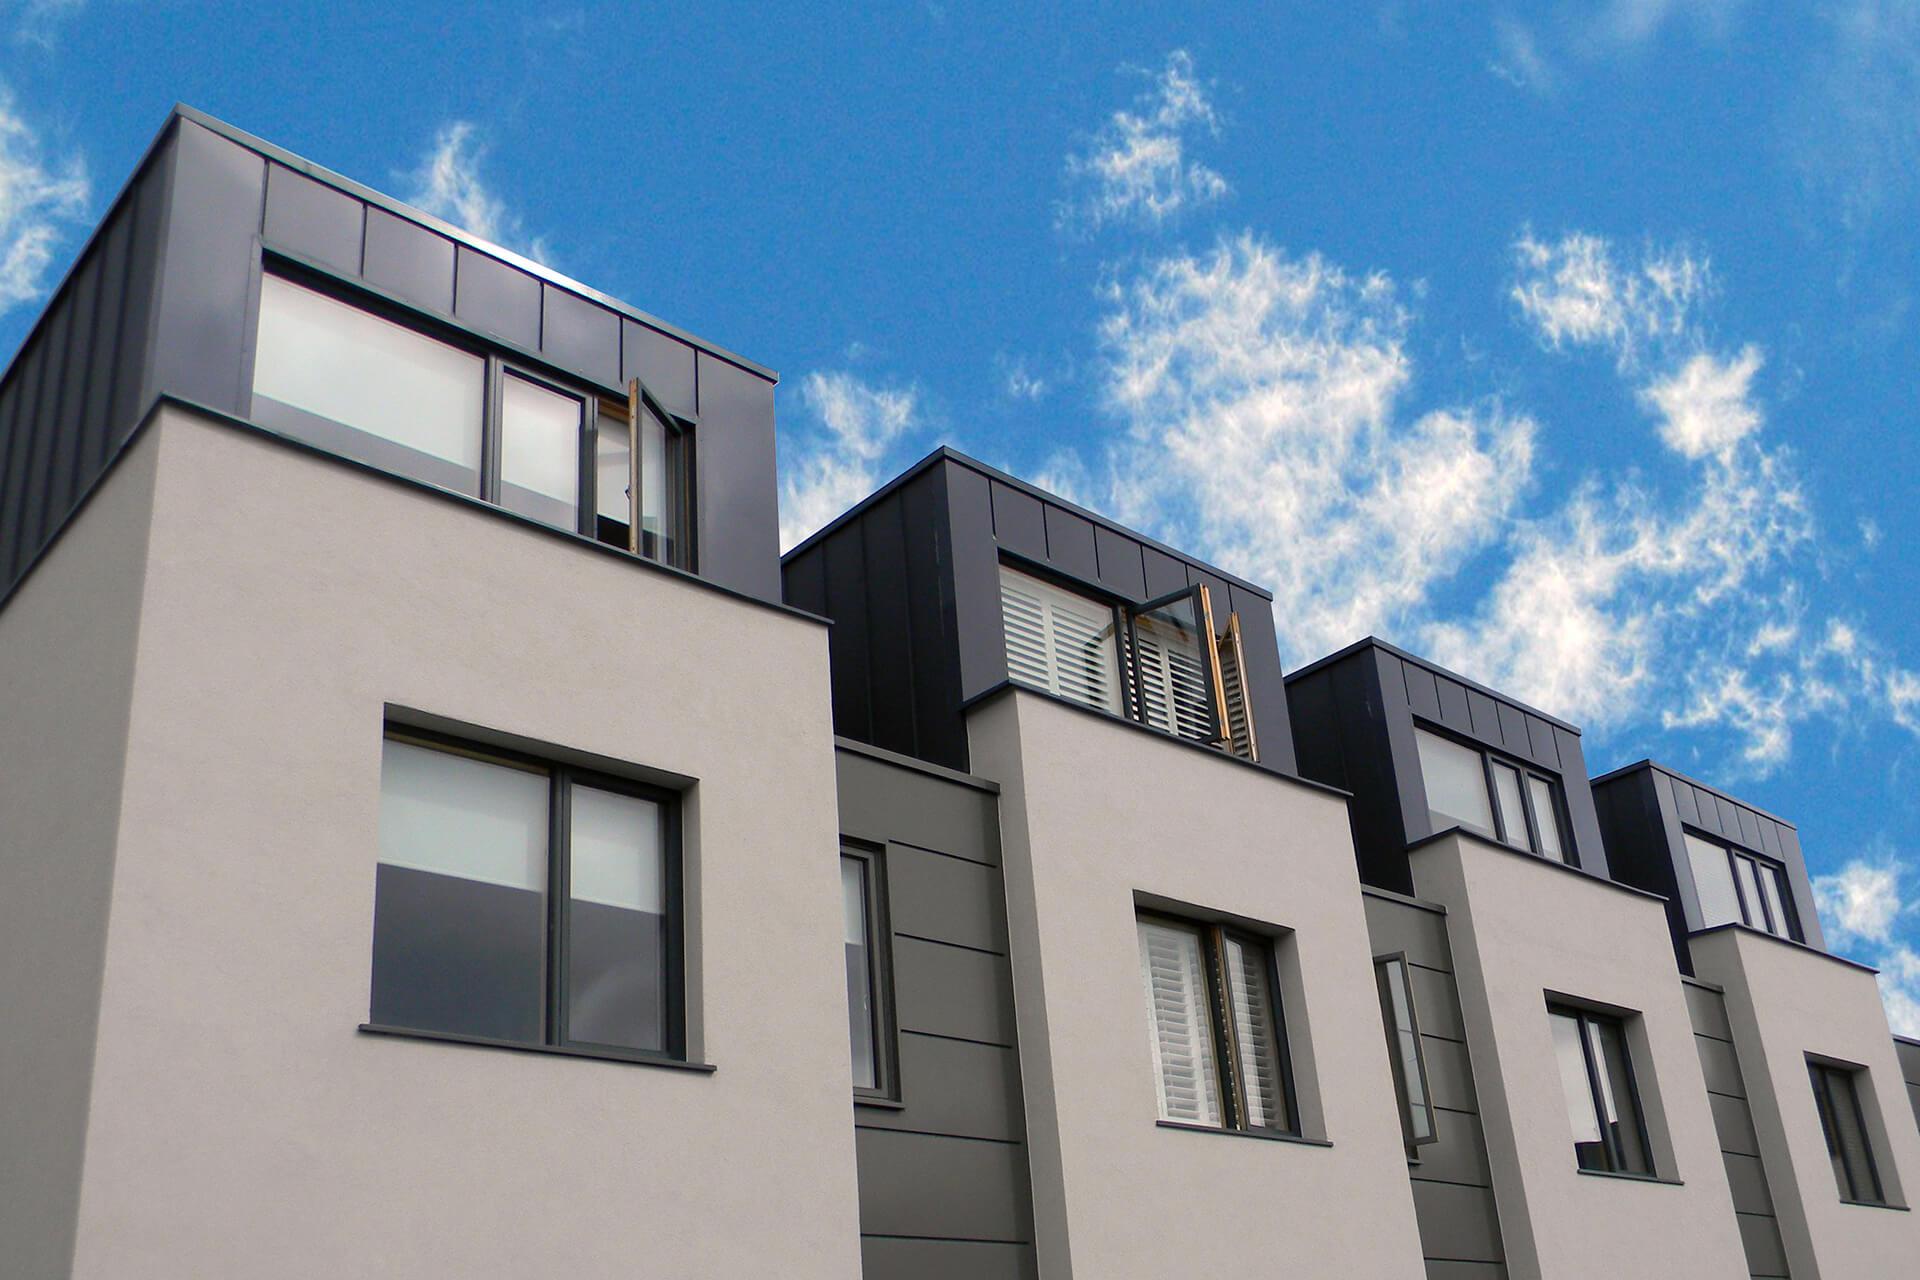 Membrane synth tique pour toiture cctp exemples for Cctp architecte